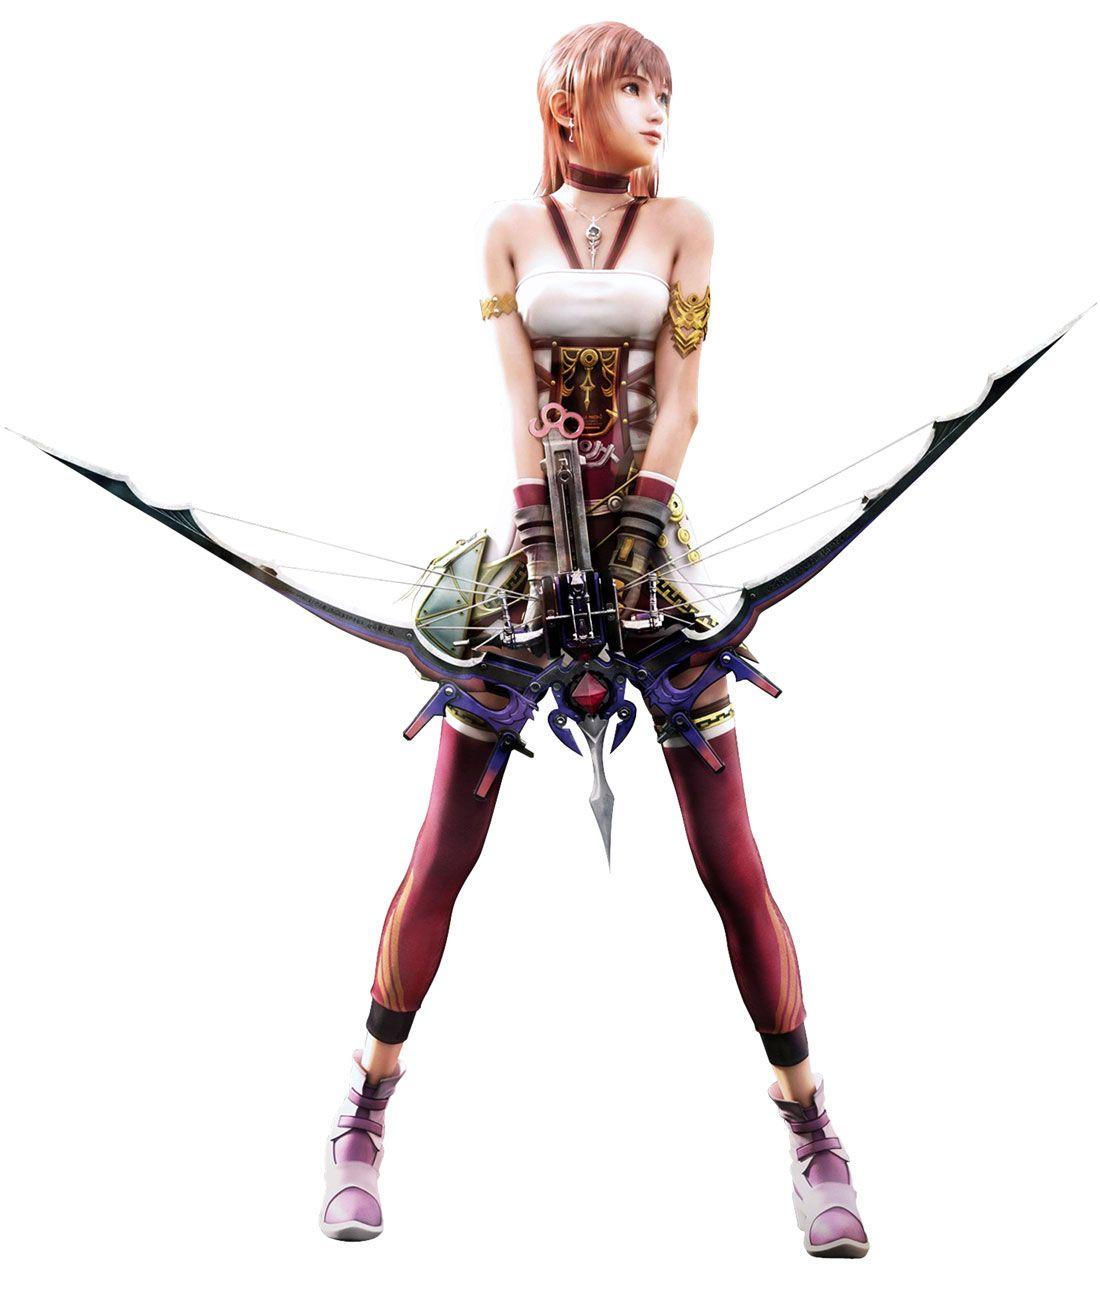 Character Design Final Fantasy Xii : Serah characters art final fantasy xiii